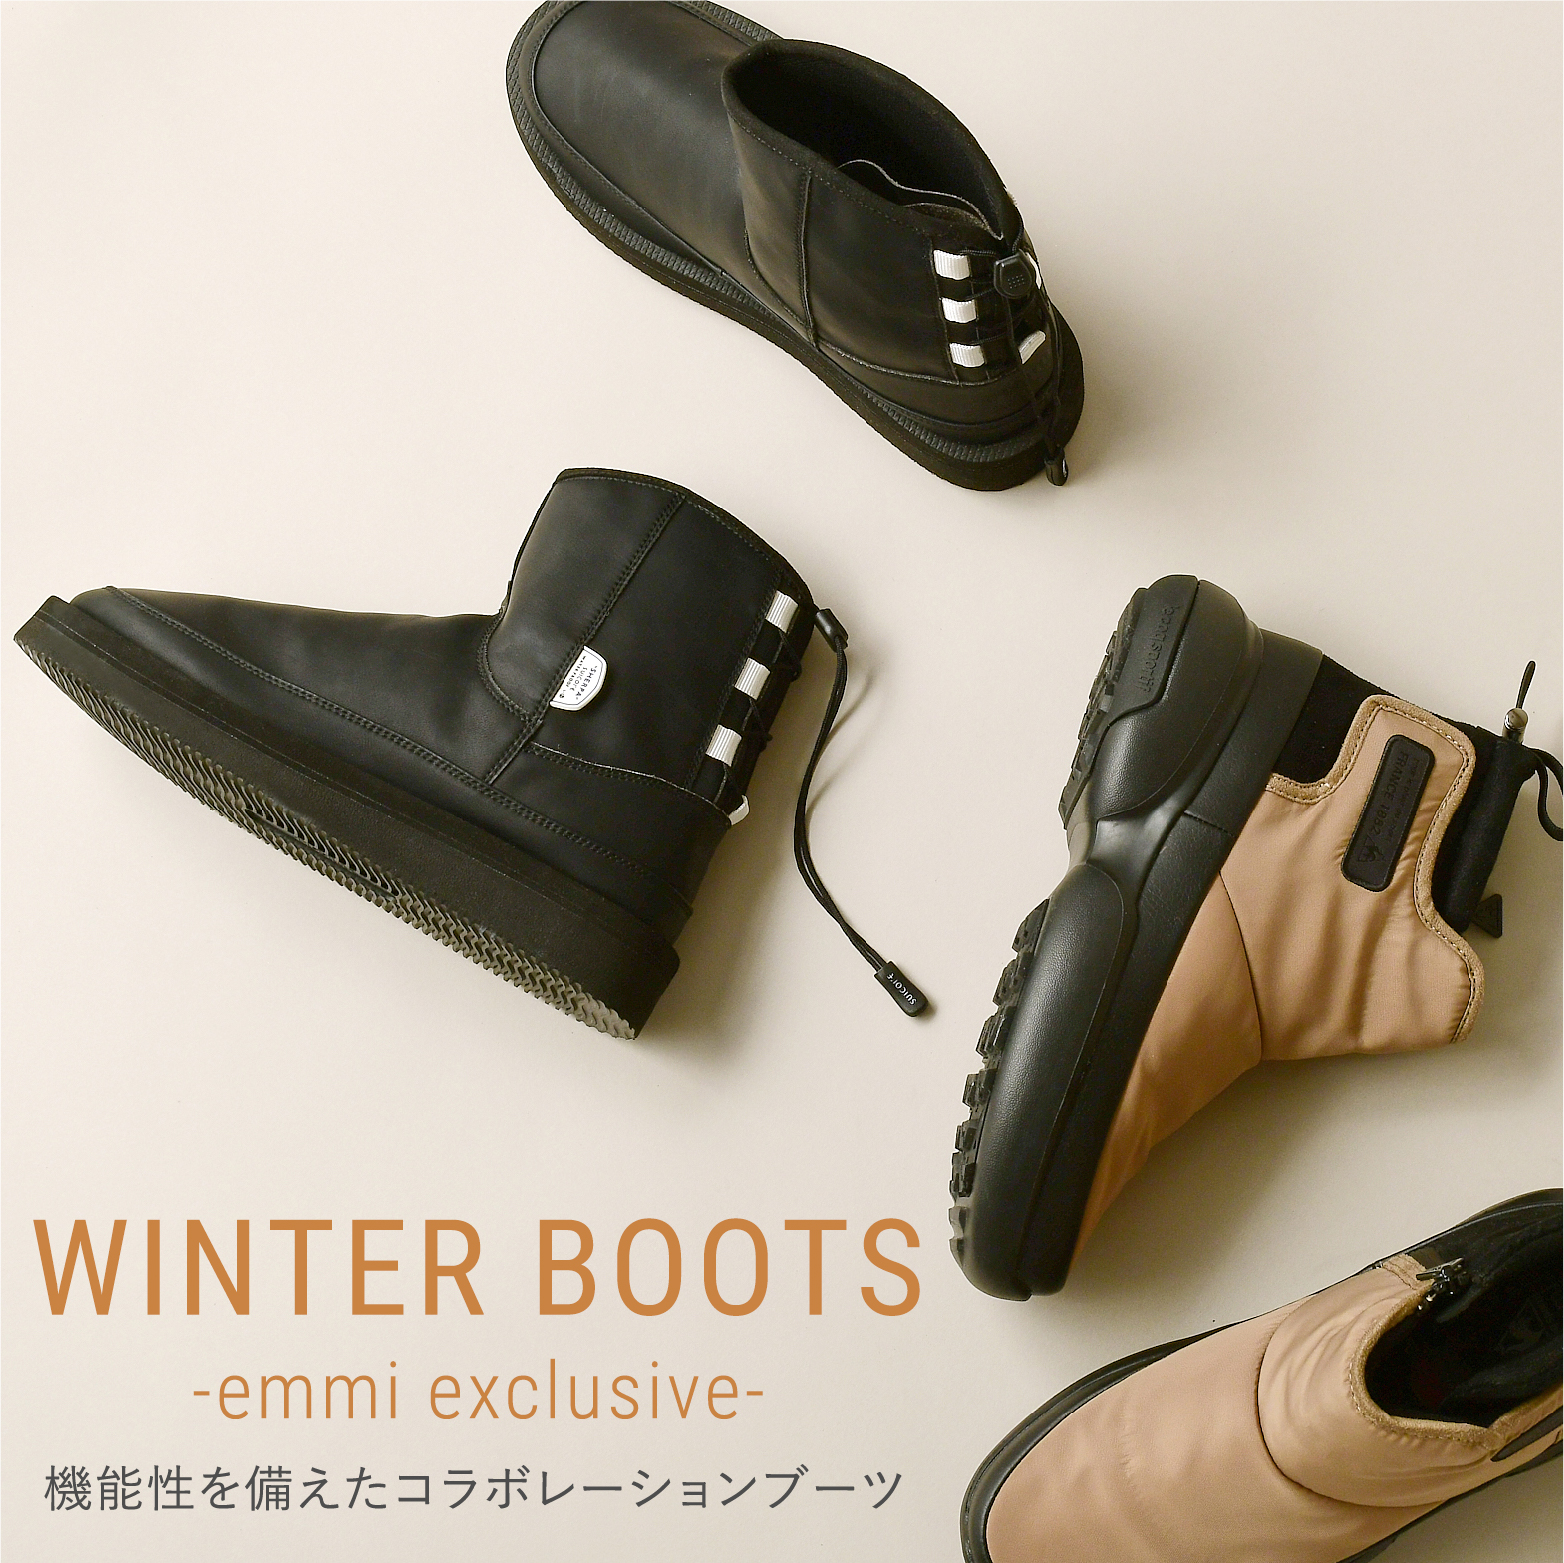 WINTER BOOTS -emmi exclusive- 機能性を備えたコラボレーションブーツ